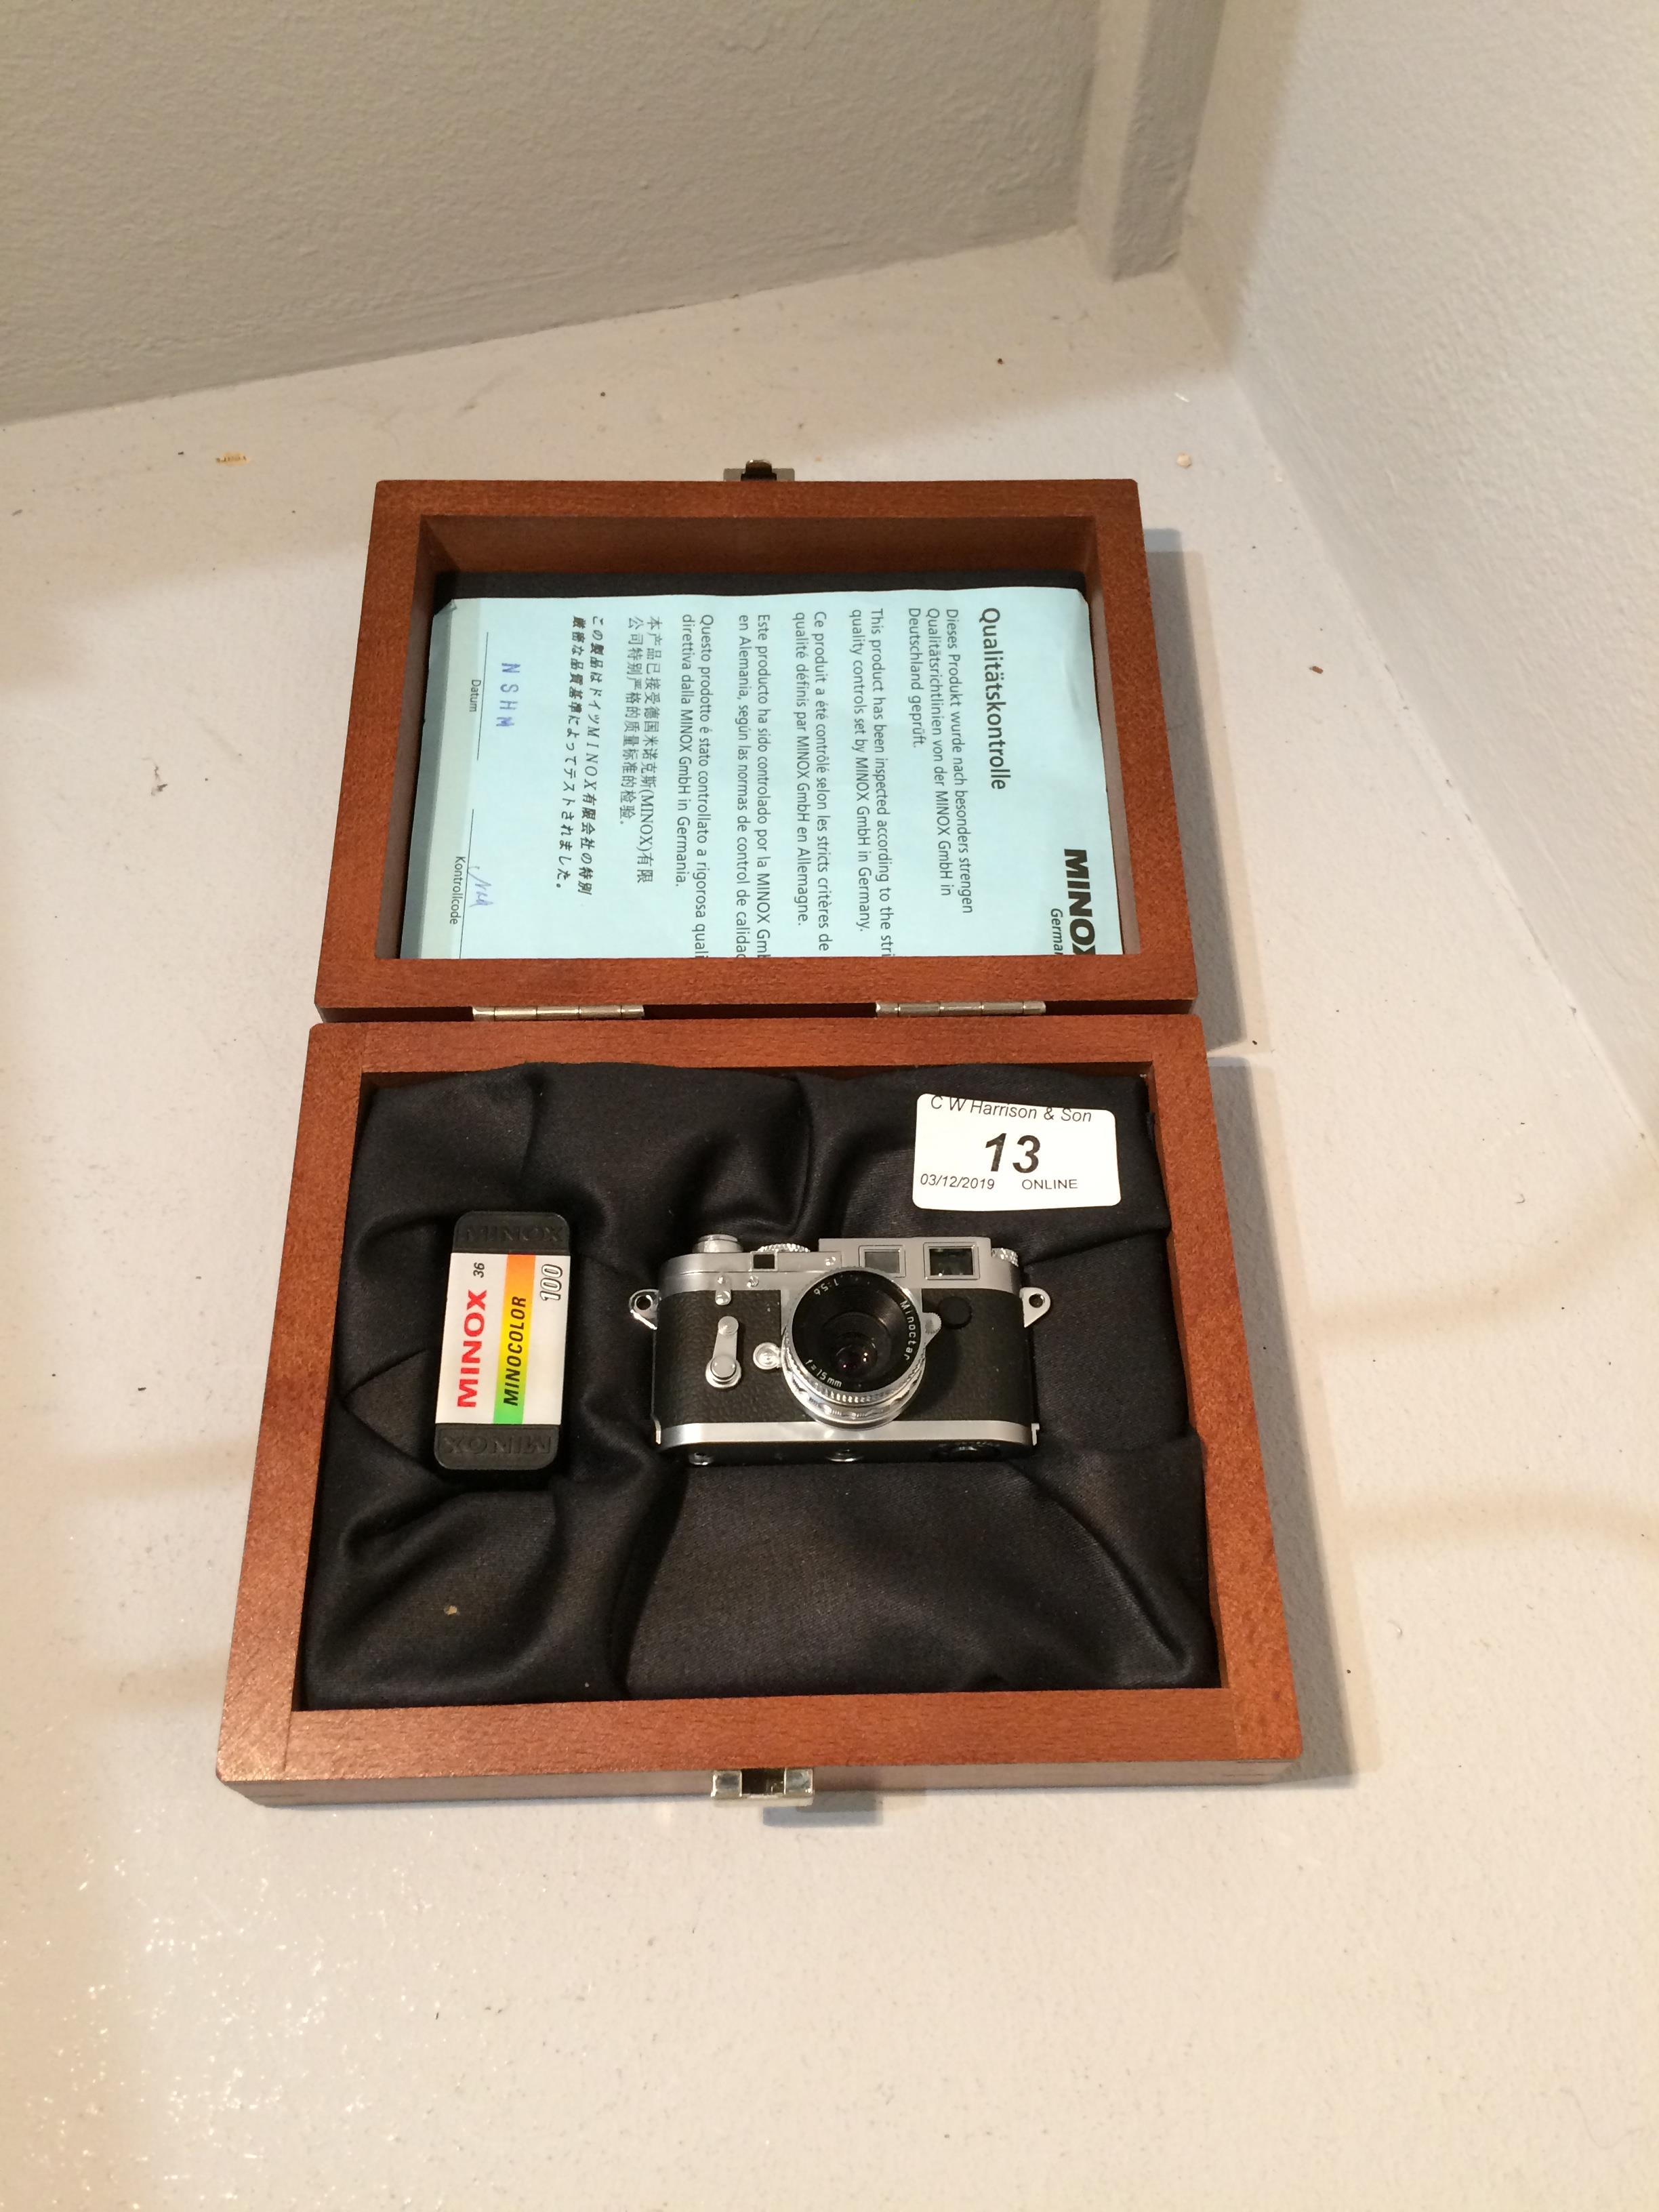 Lot 13 - Minox Camera Collections miniature Leica M3E11840 camera Minoctar l.115.